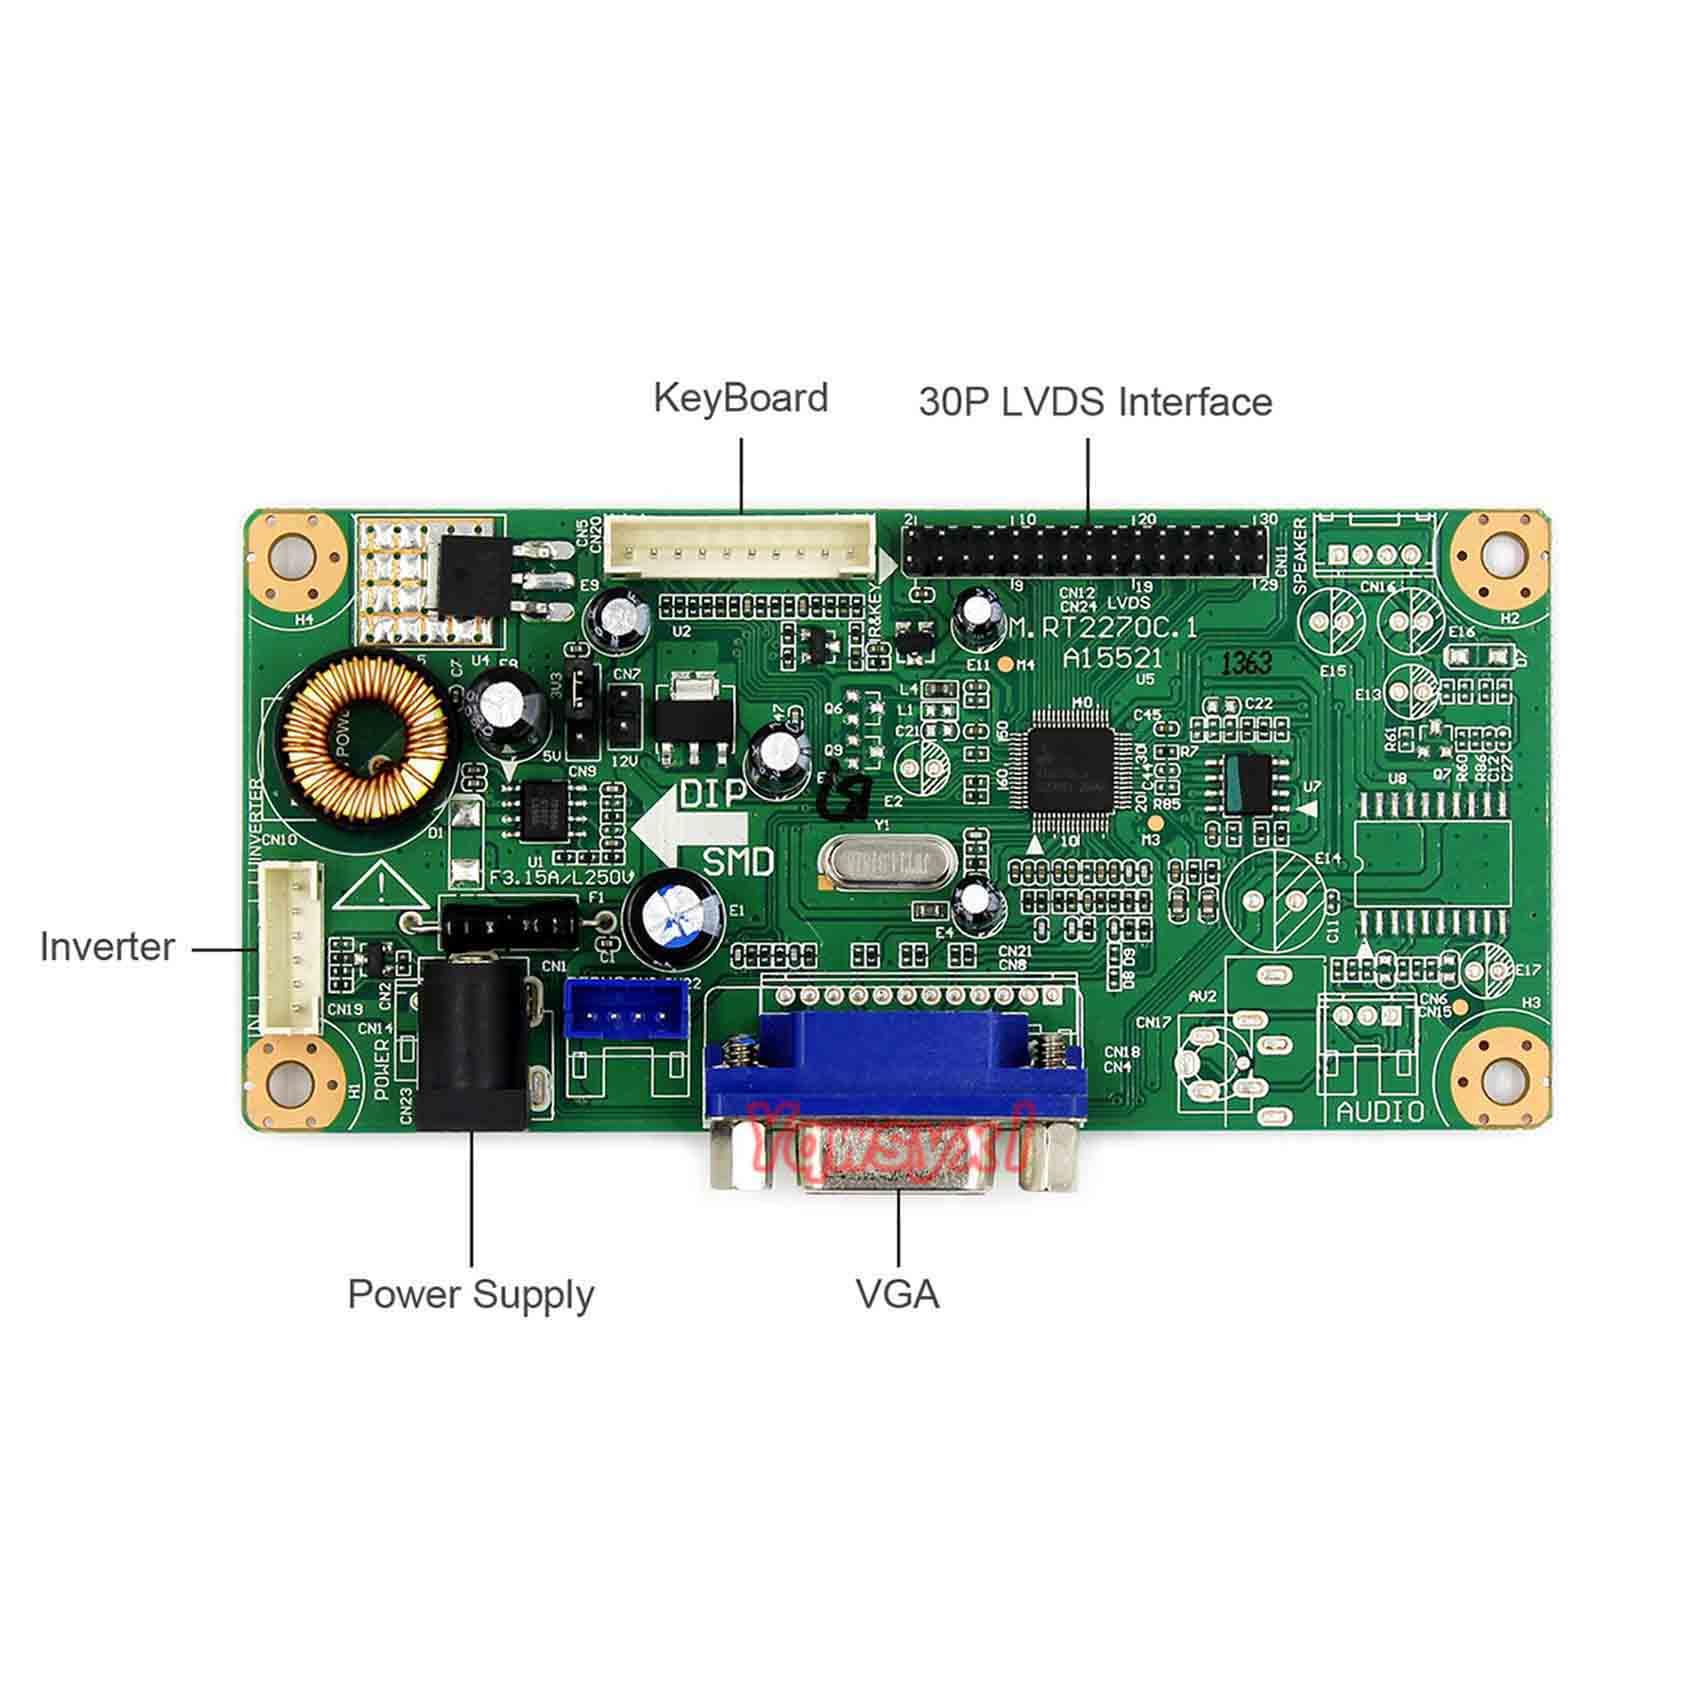 Yqwsyxl vga lcd controlador placa de trabalho para 6.5 polegada g065vn01 v.2 v2 640x480 lcd tela rt2270 placa motorista